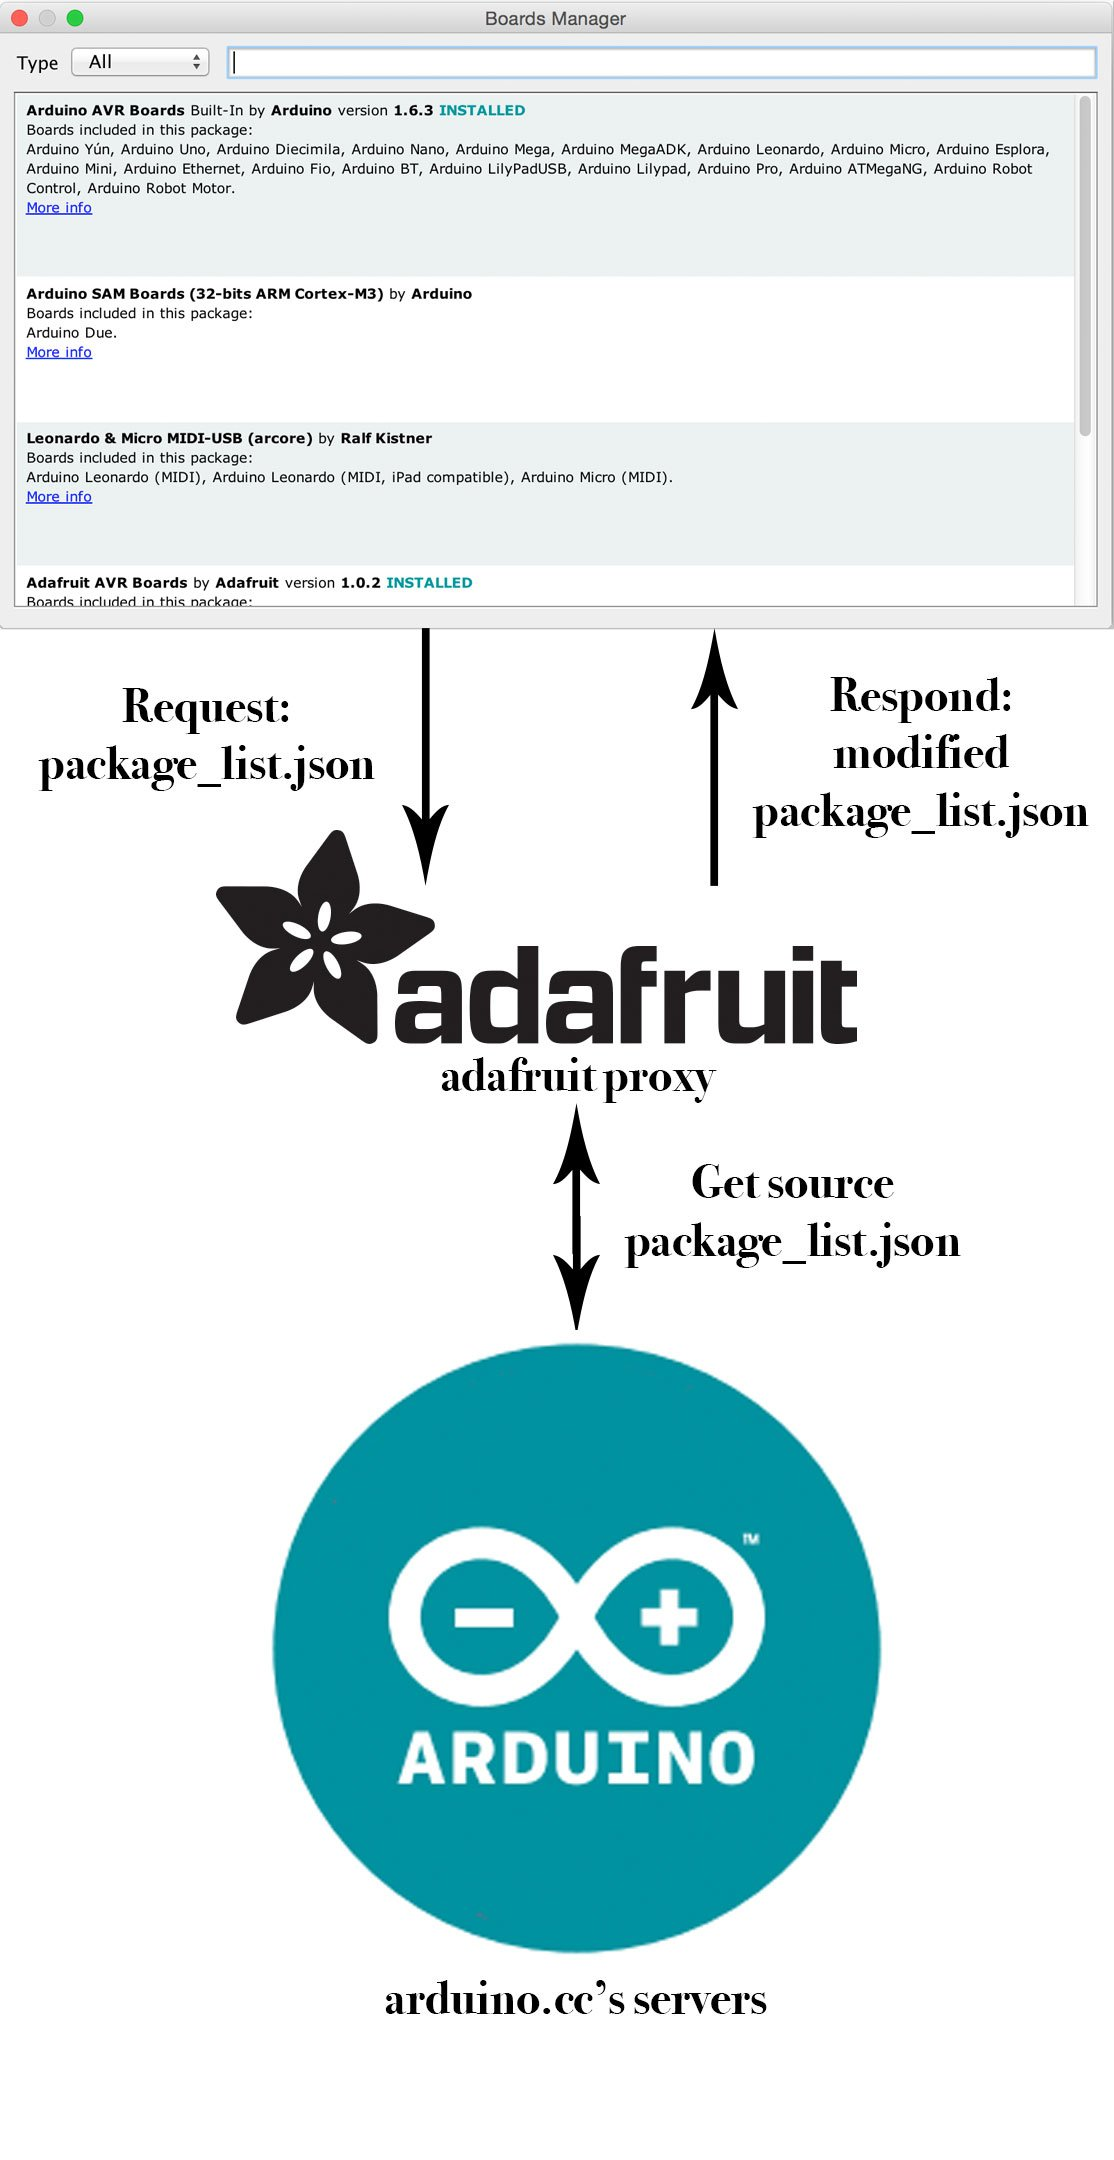 adafruit_products_proxy.jpg